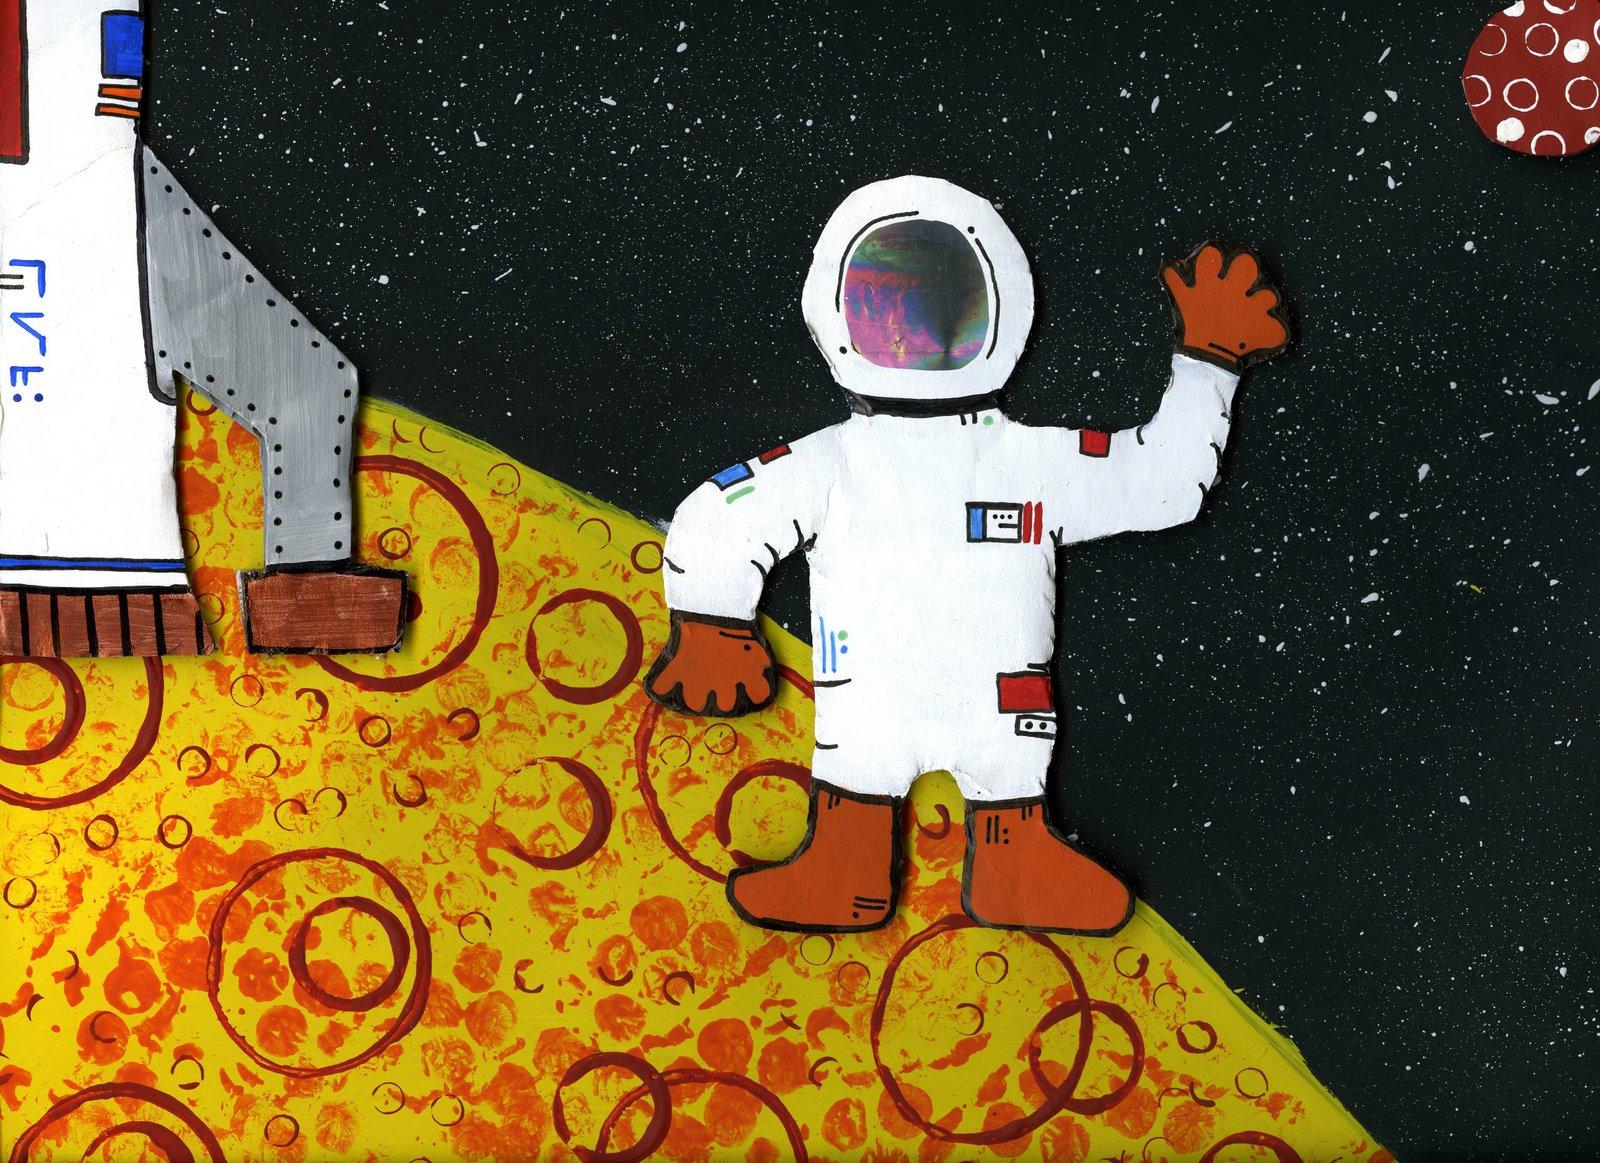 astronaut art project - photo #14